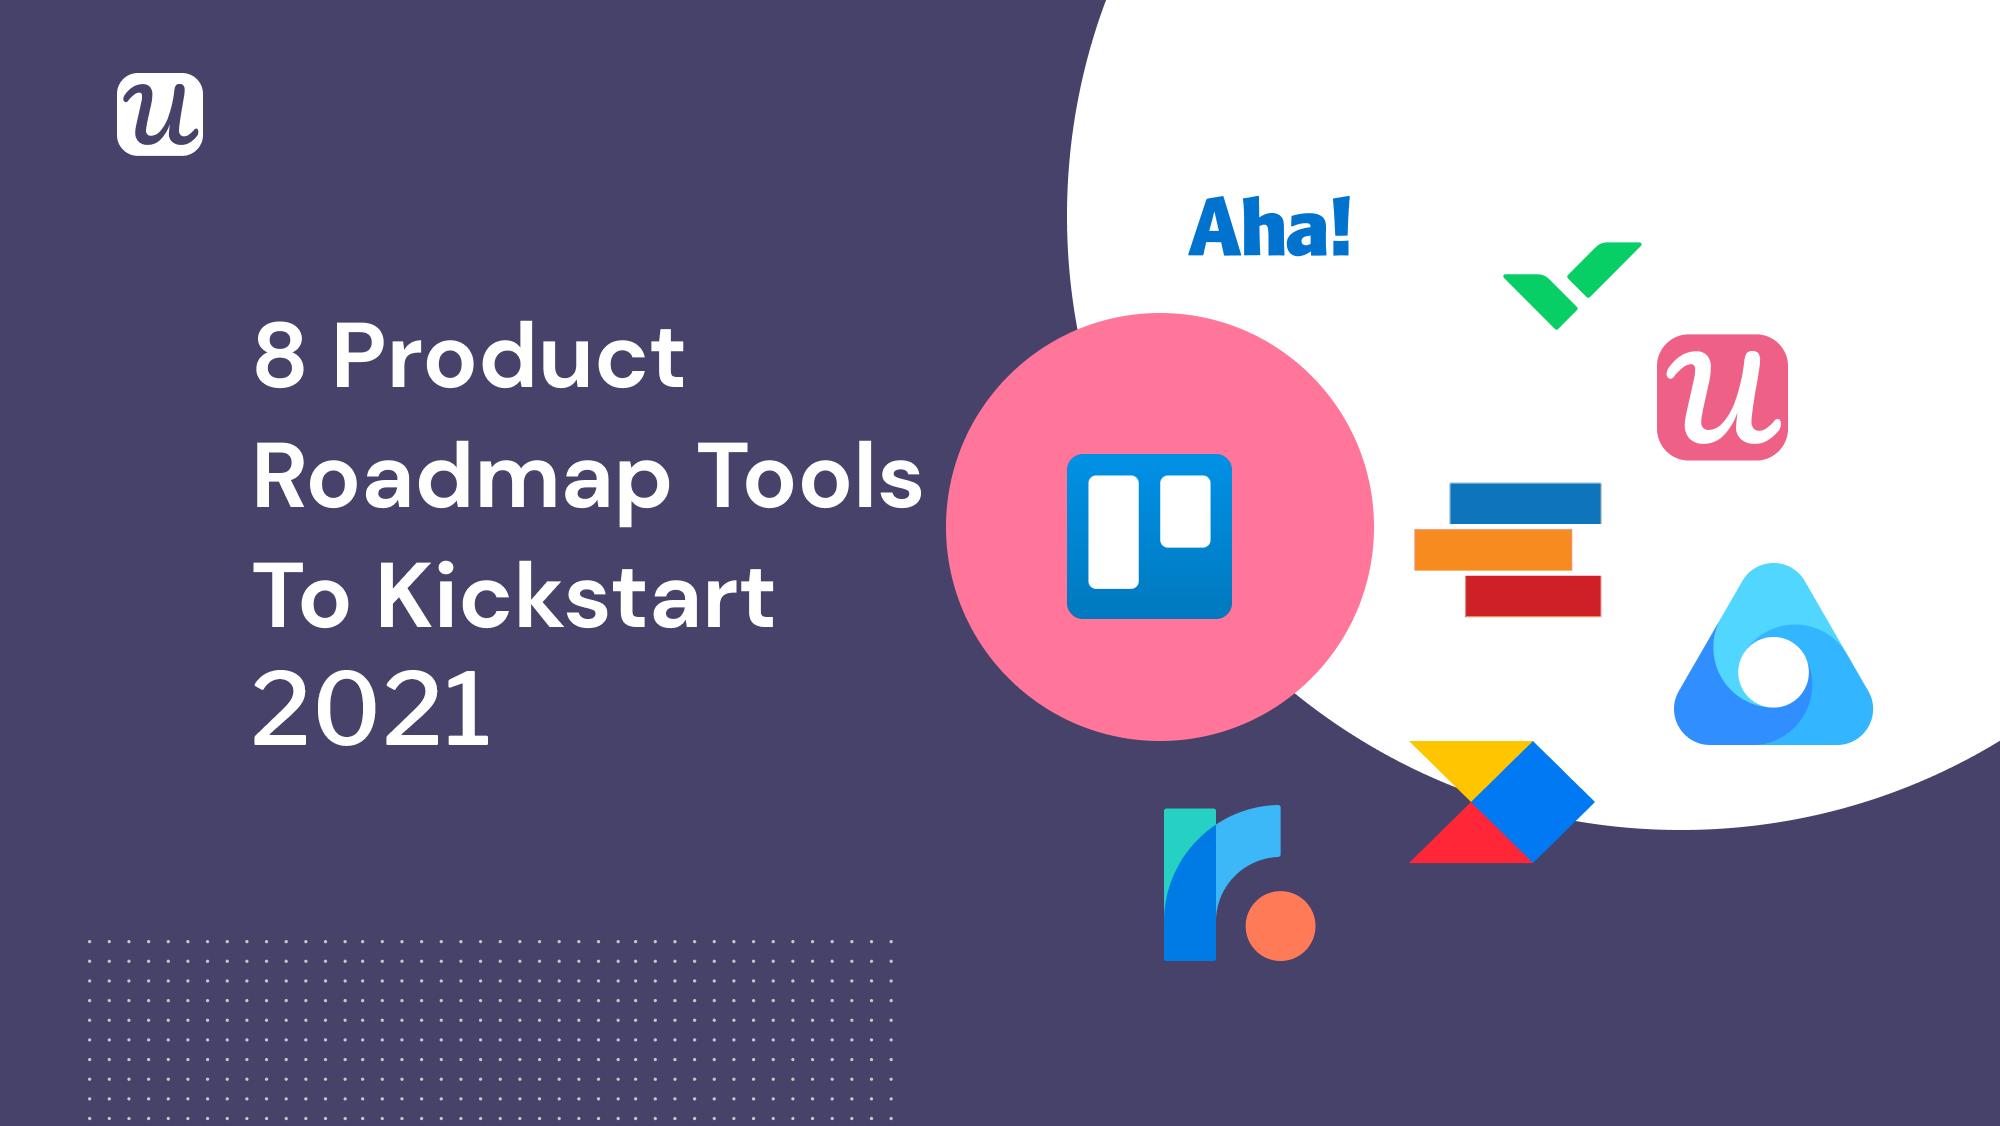 product roadmap tools